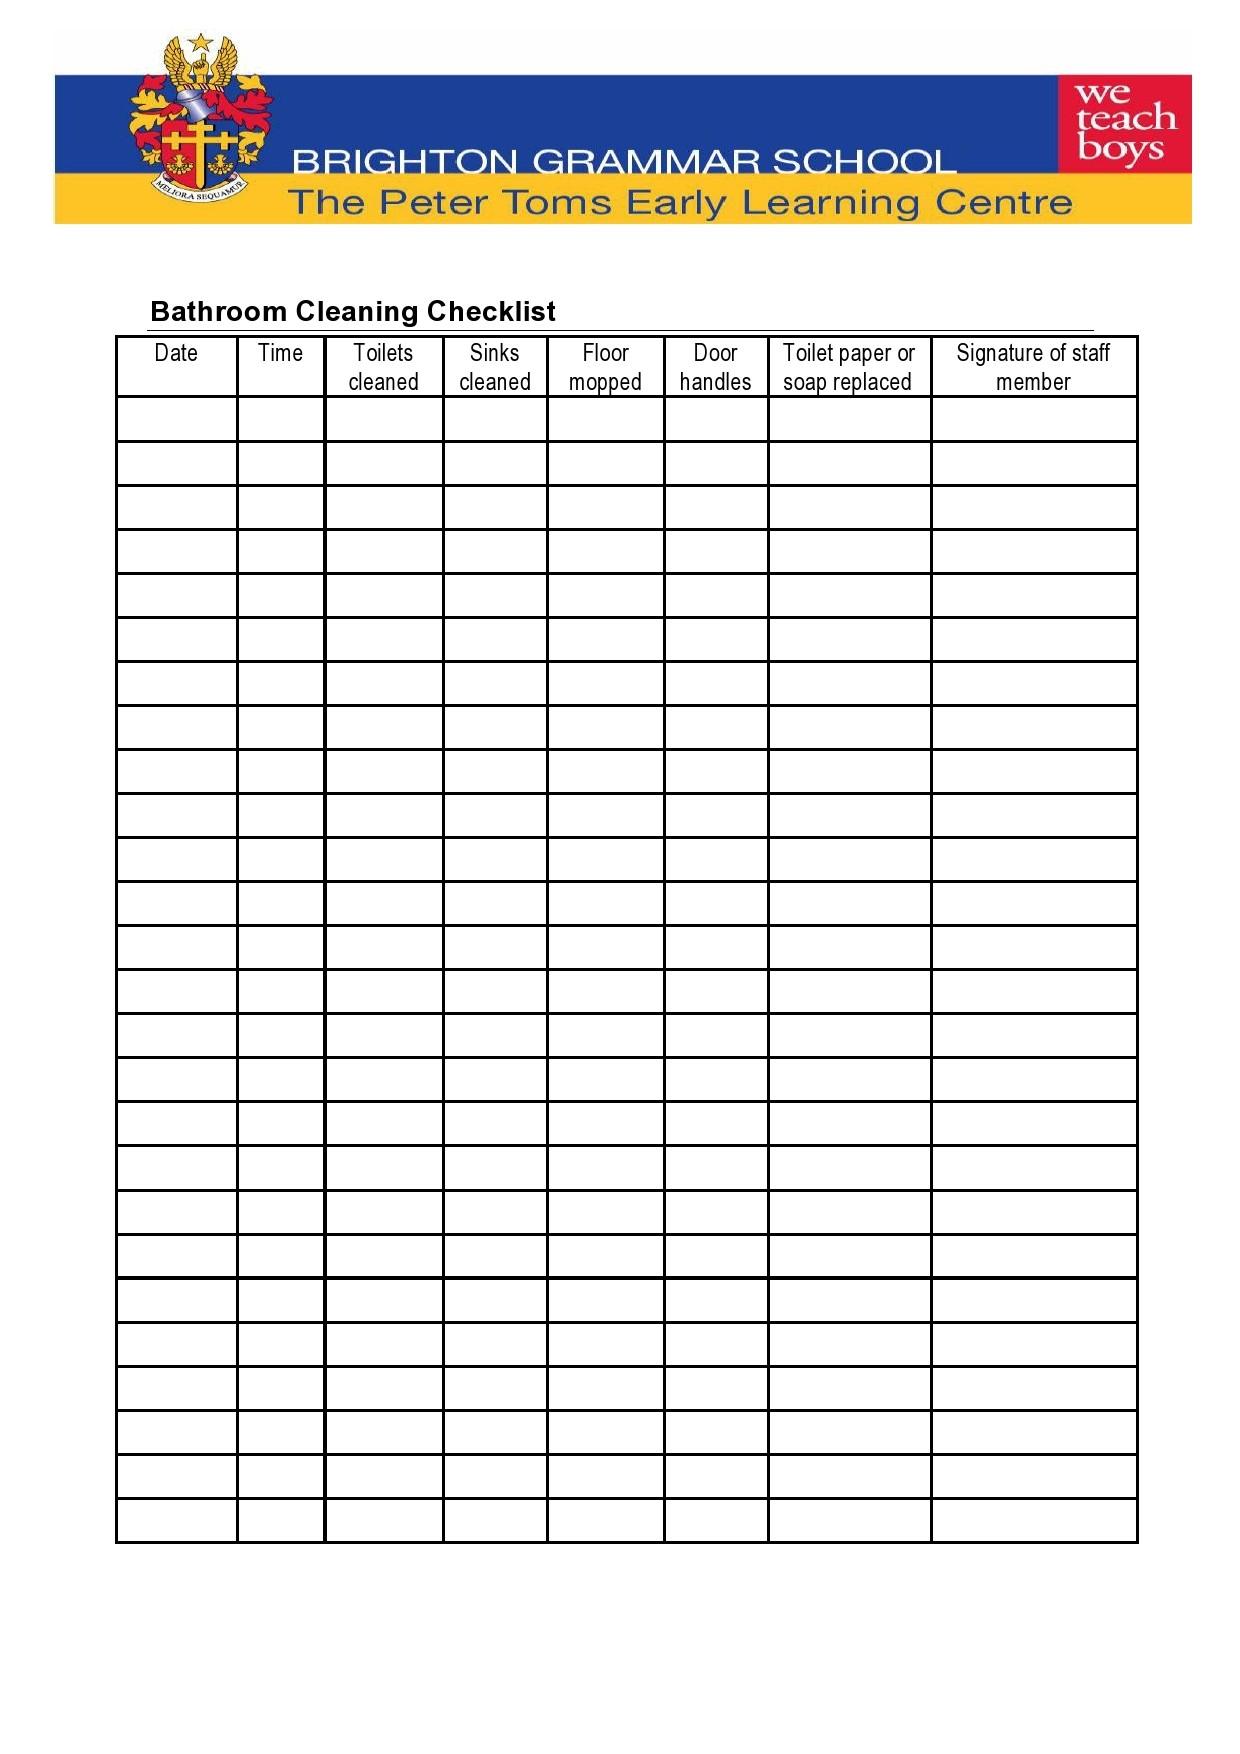 49 Printable Bathroom Cleaning Checklists Word ᐅ TemplateLab